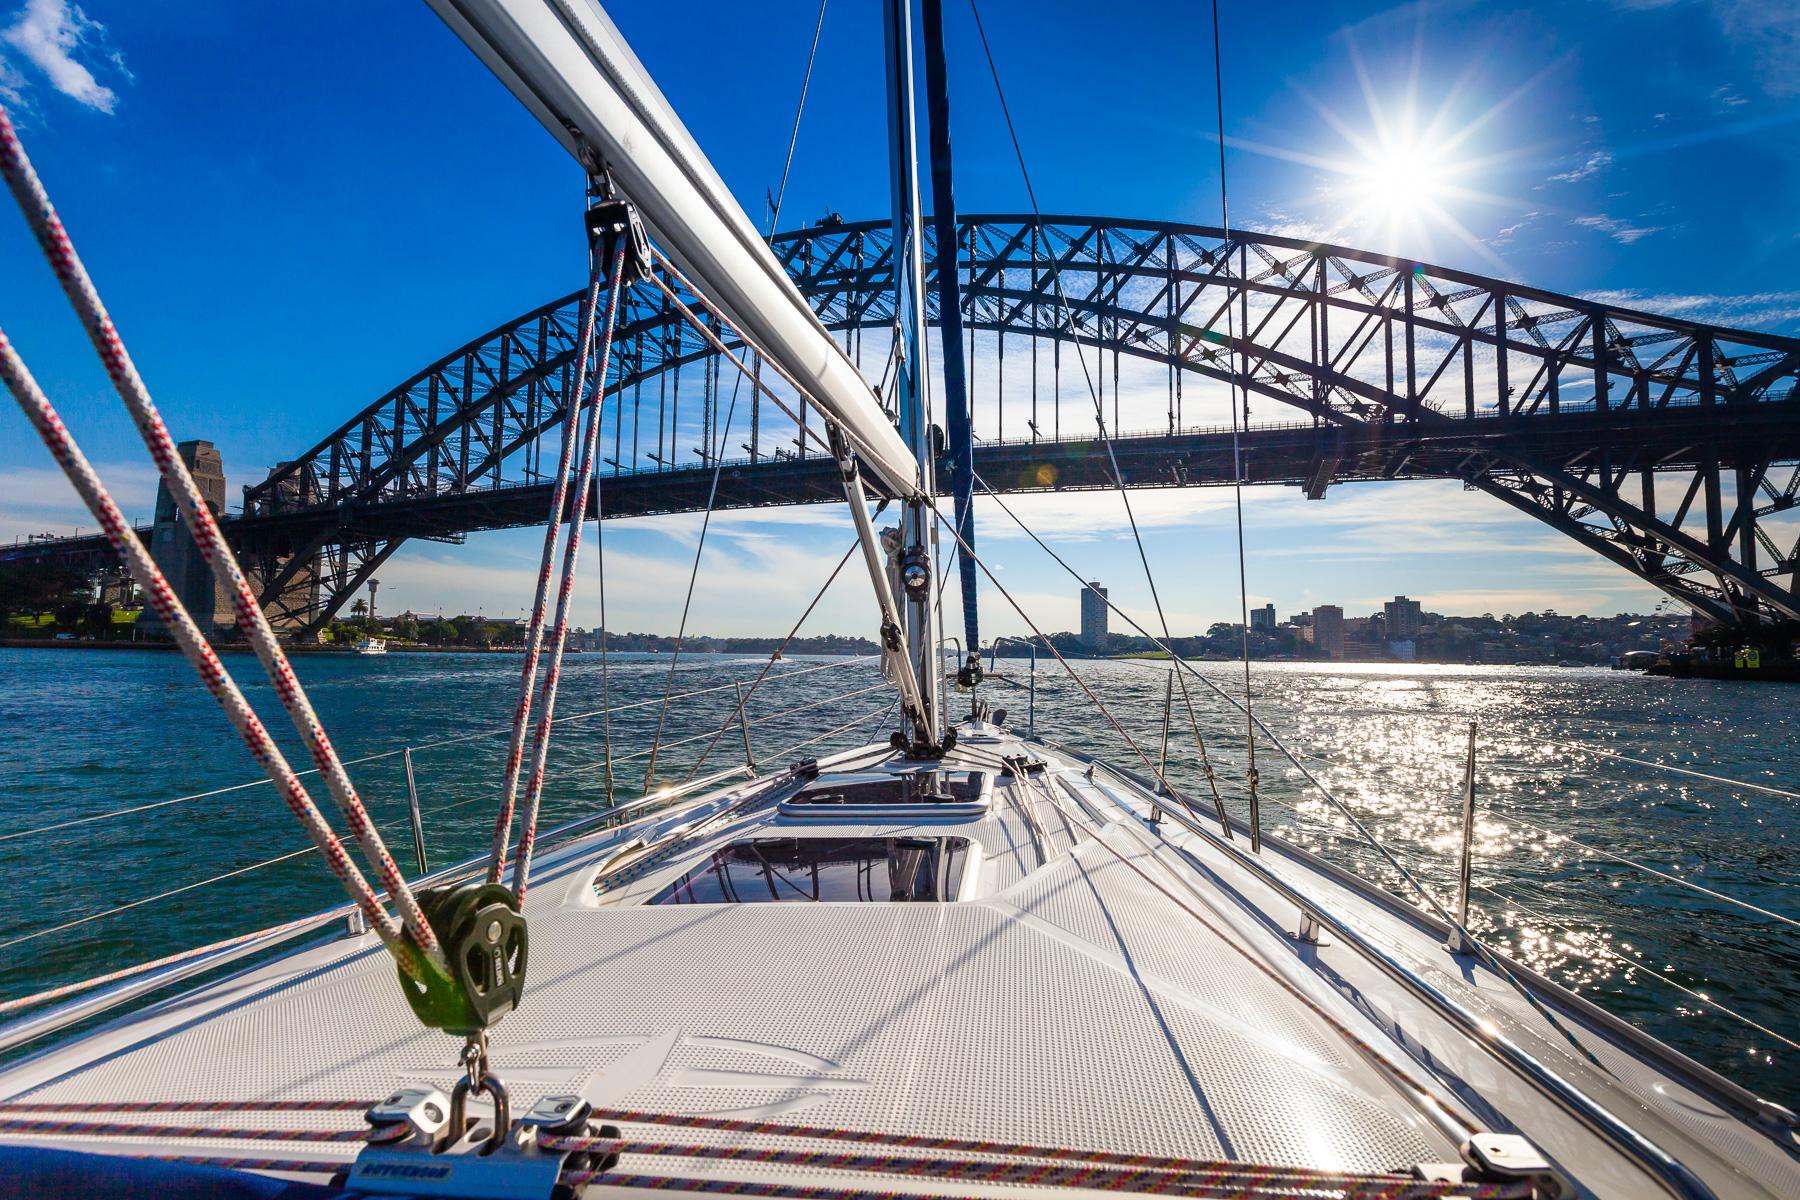 Sailing on Sydney Harbour.